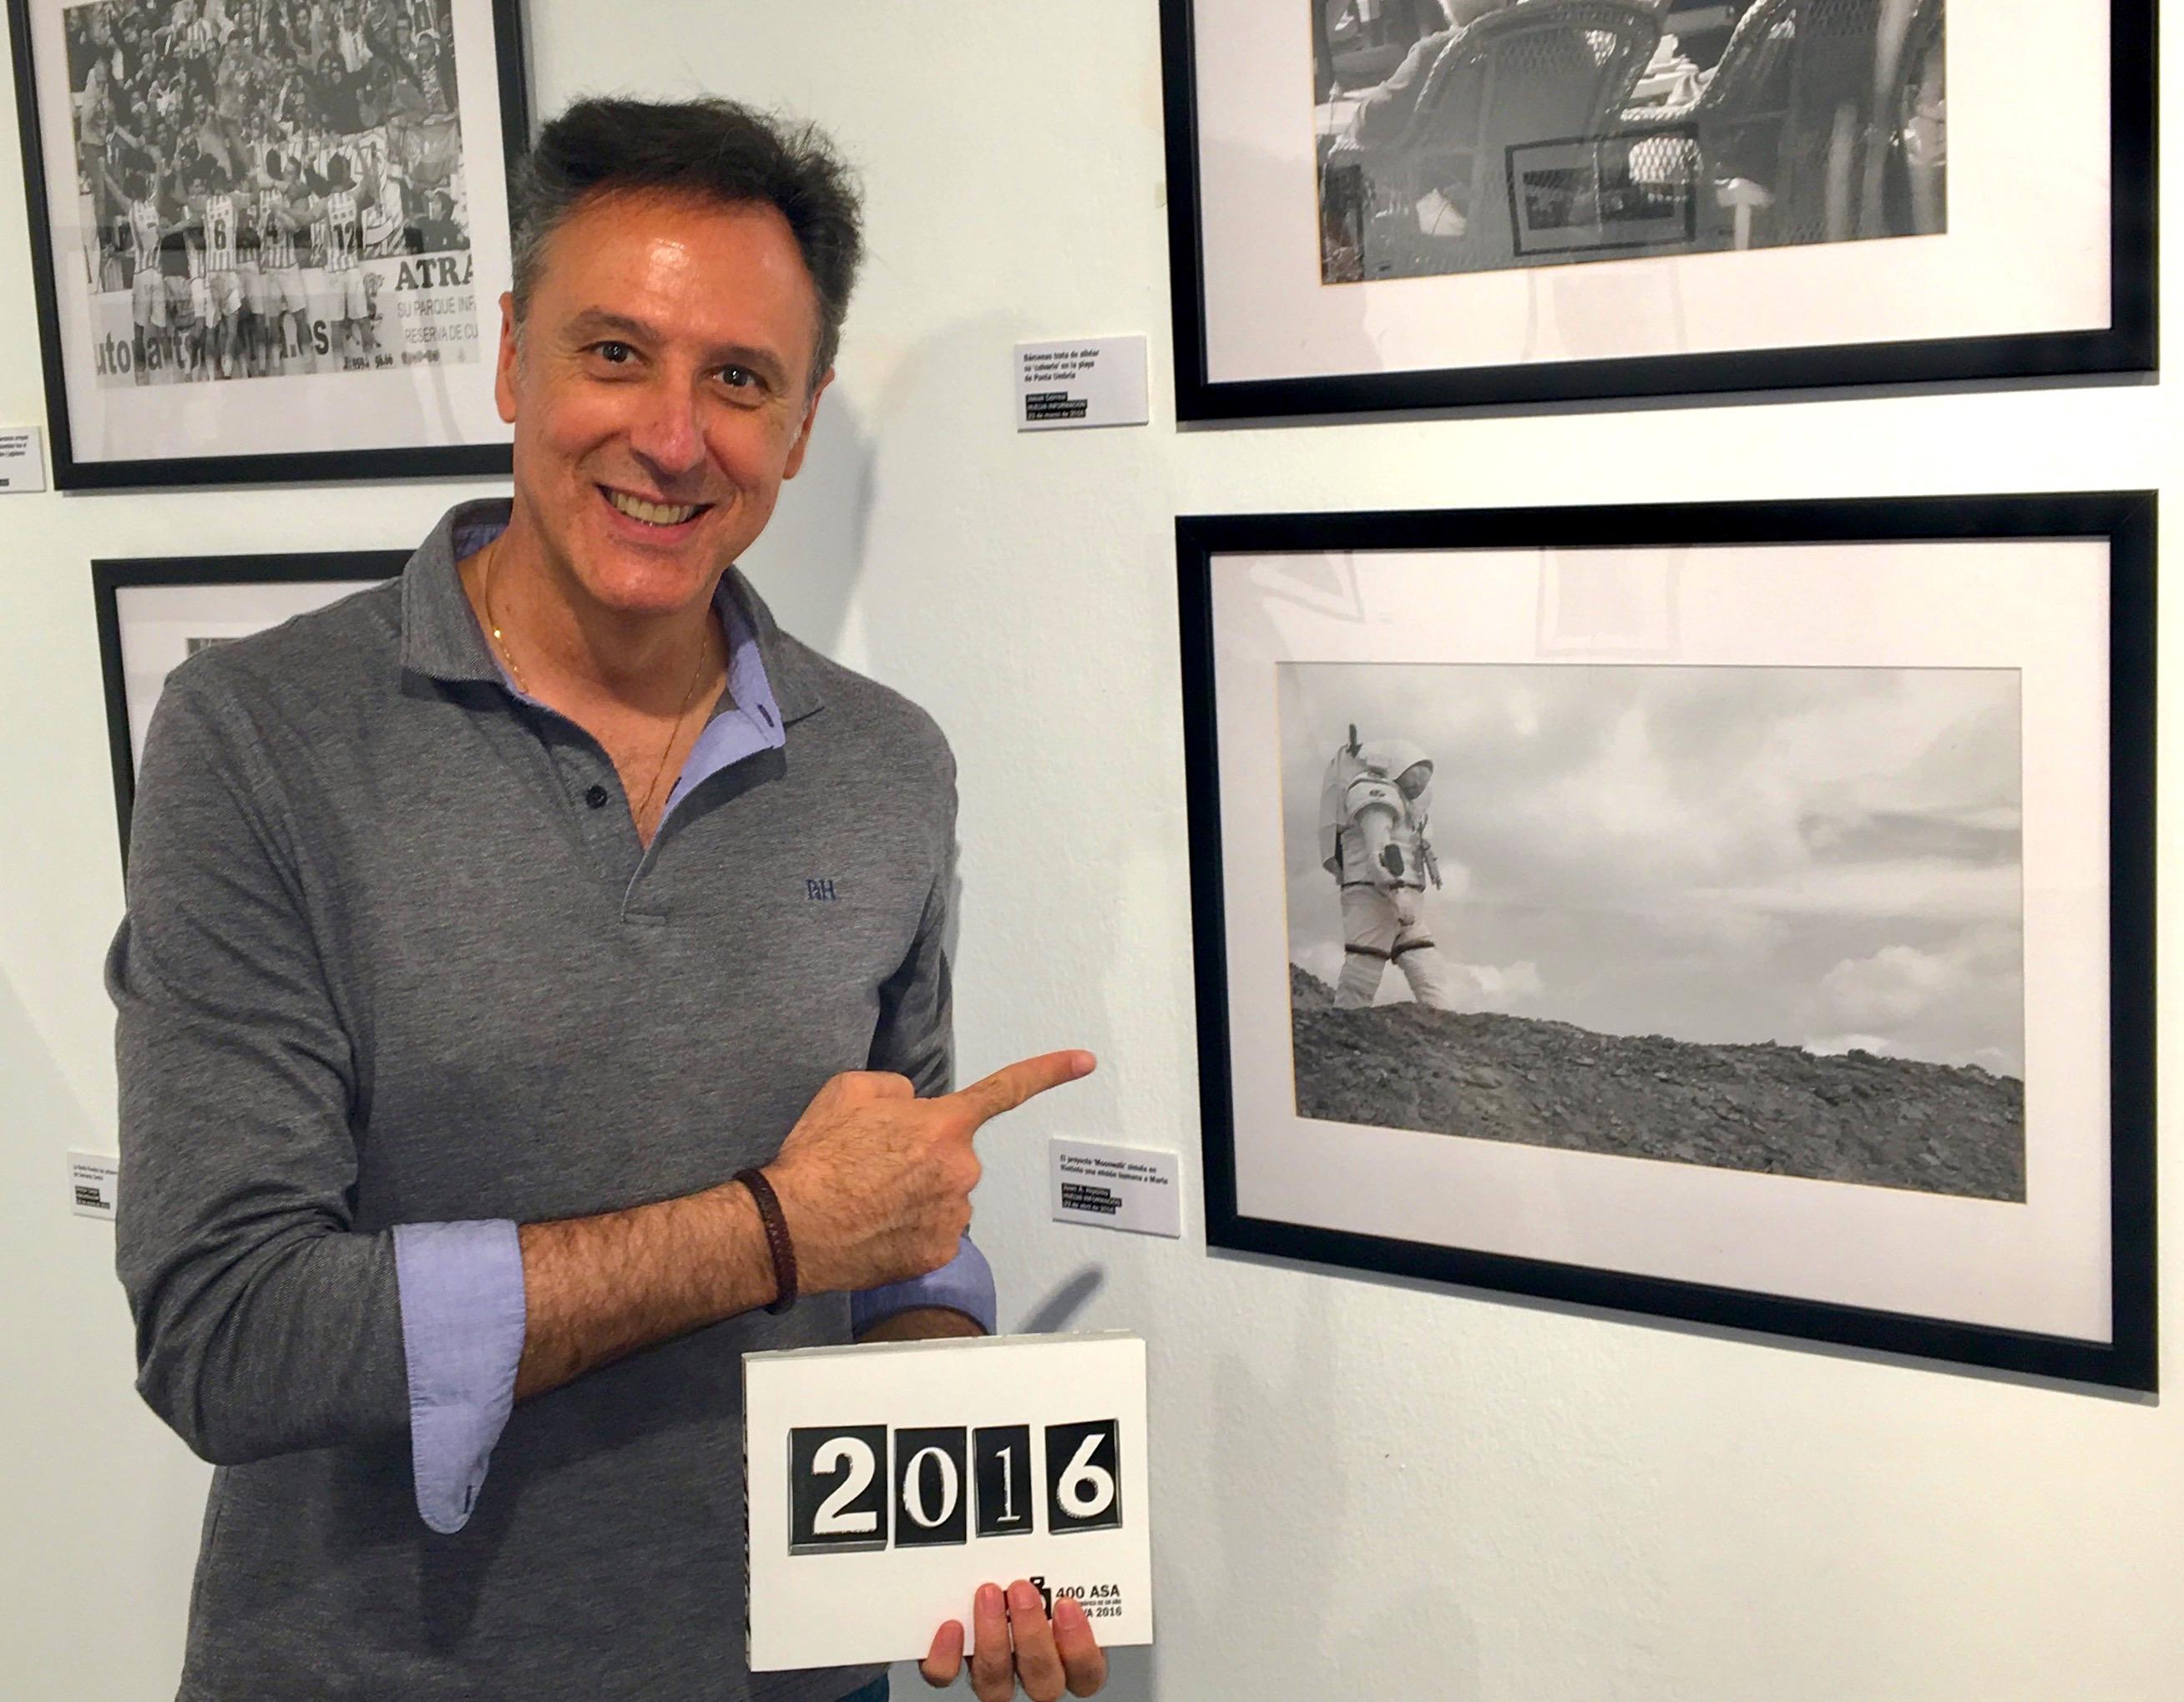 Juan Antonio Hipólito Domínguez-Anuario Prensa 2016